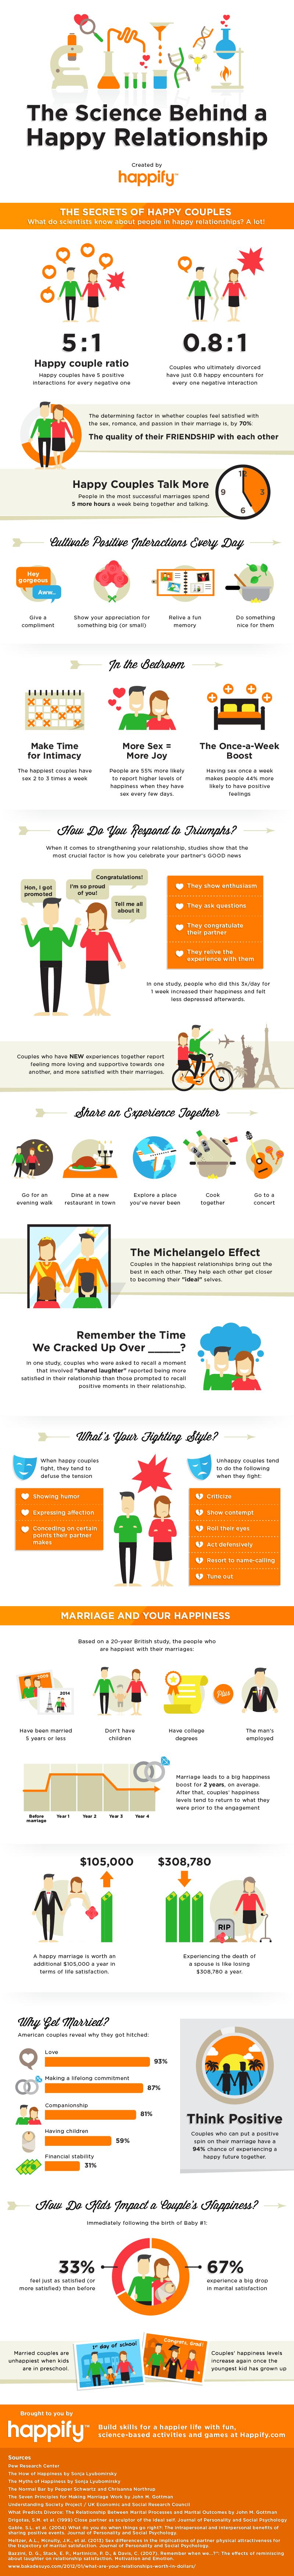 infographic_love